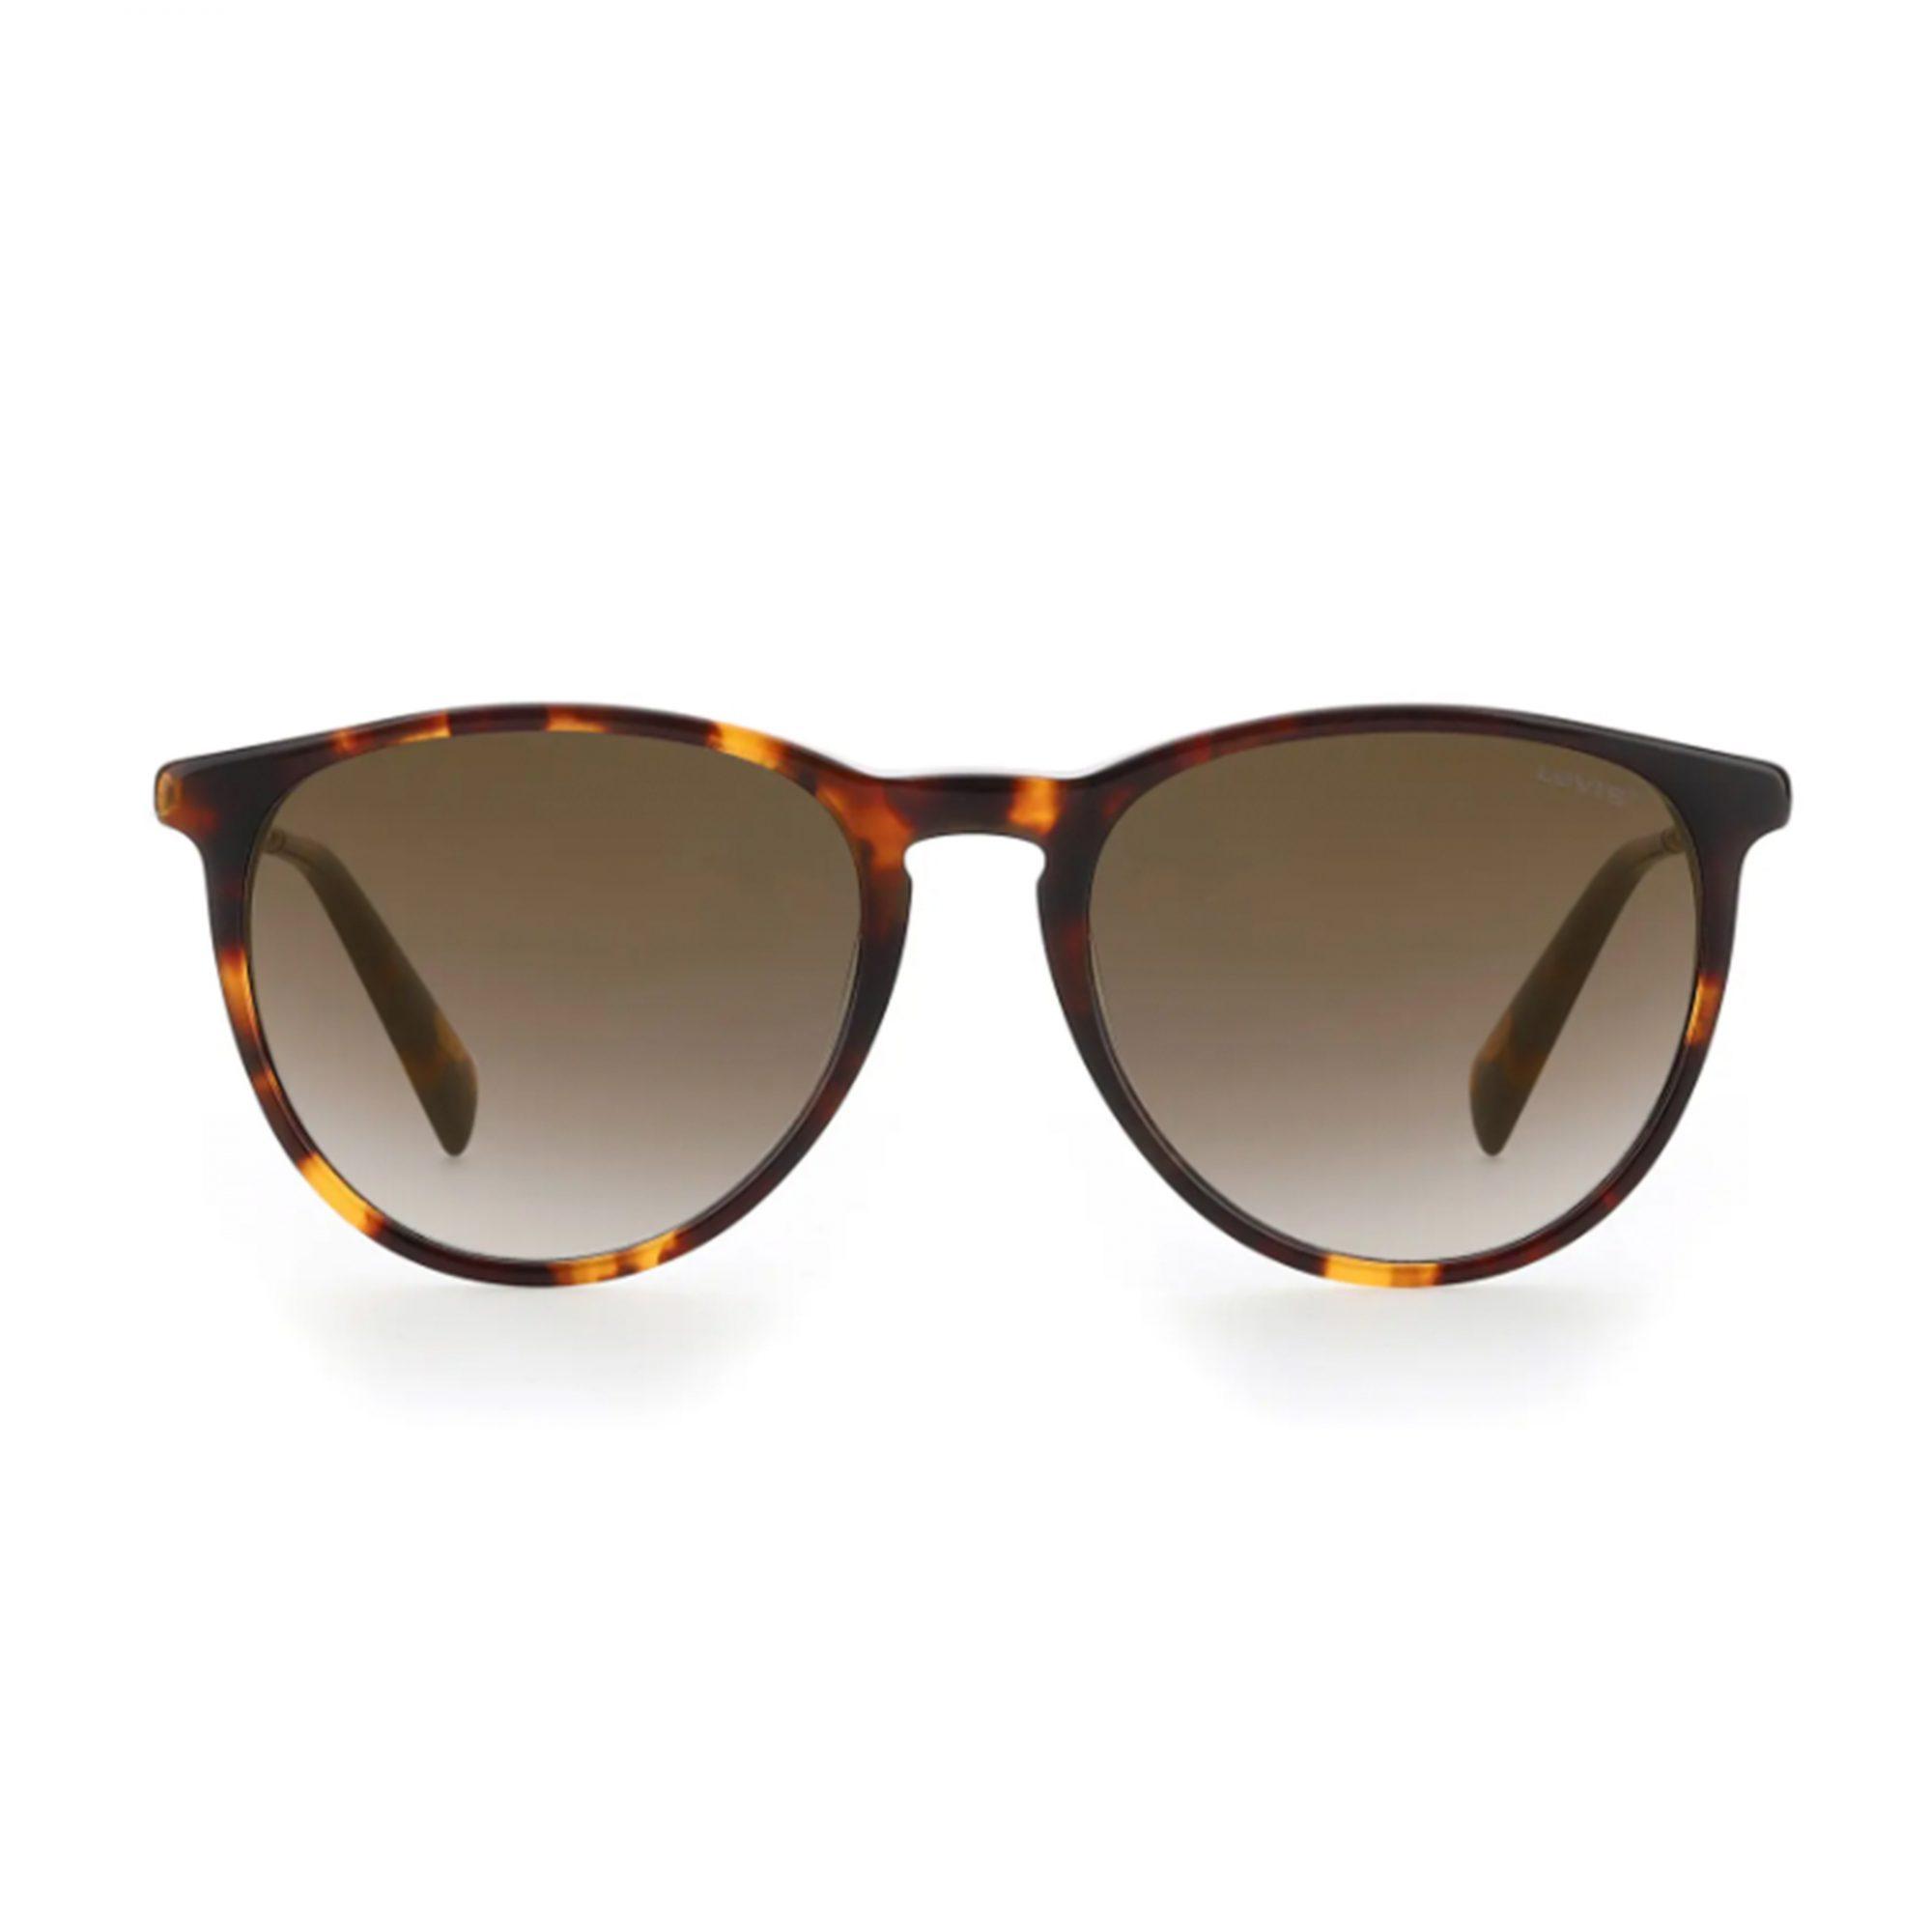 levis-gradient-mirrored-sunglasses